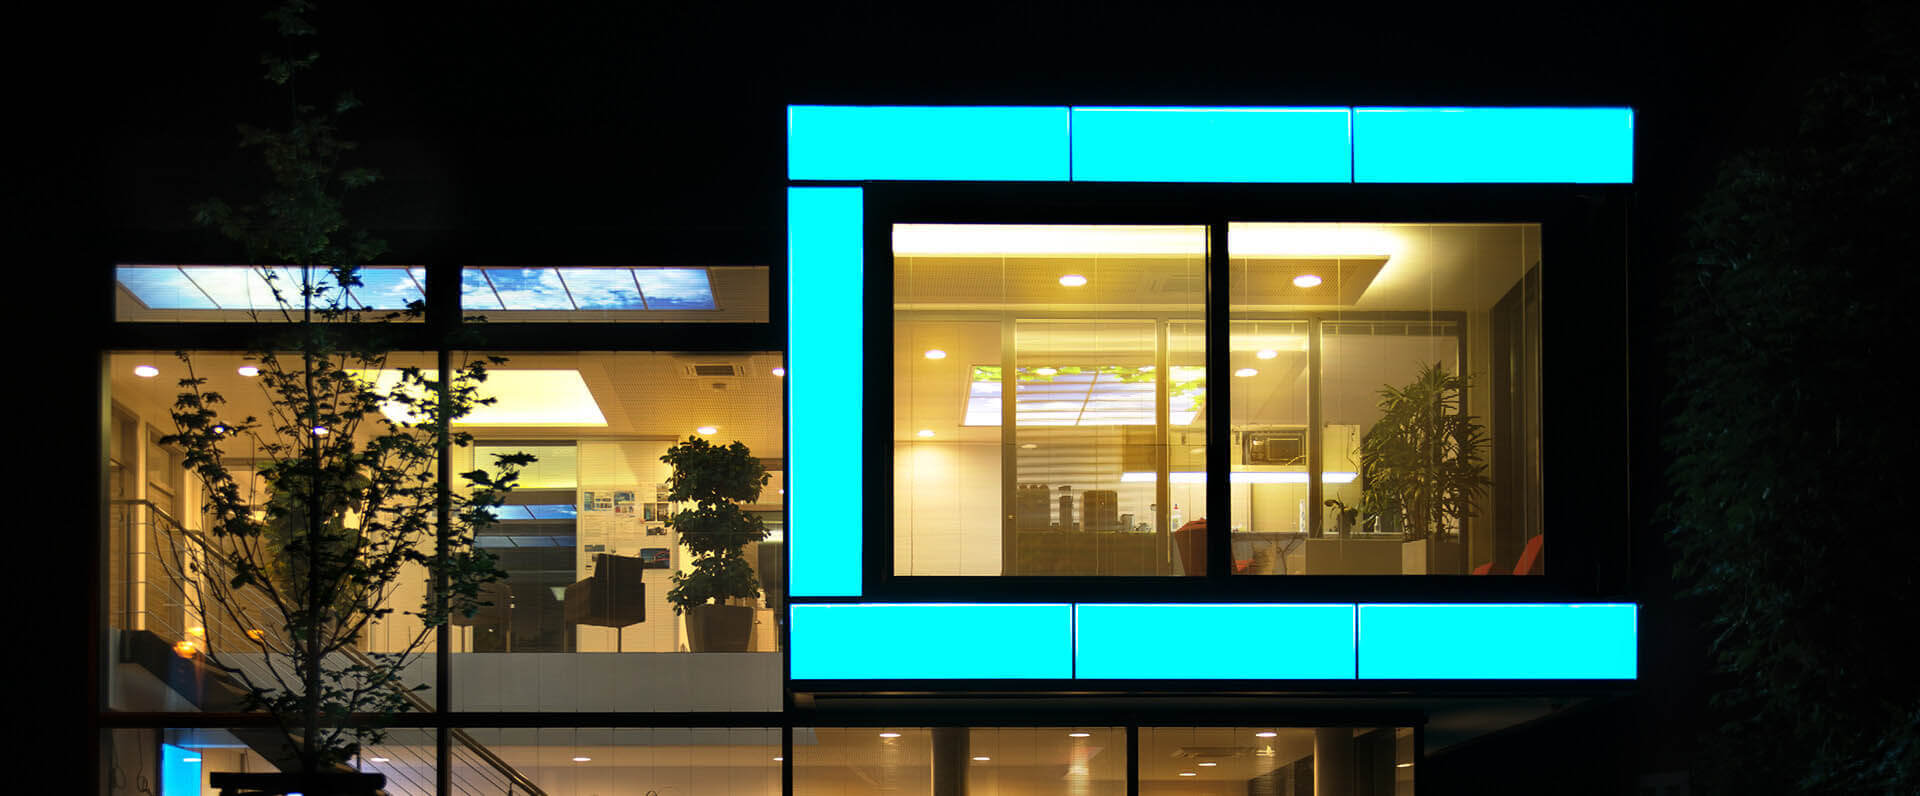 LED Fassadenpanel, LED-Flächenlicht